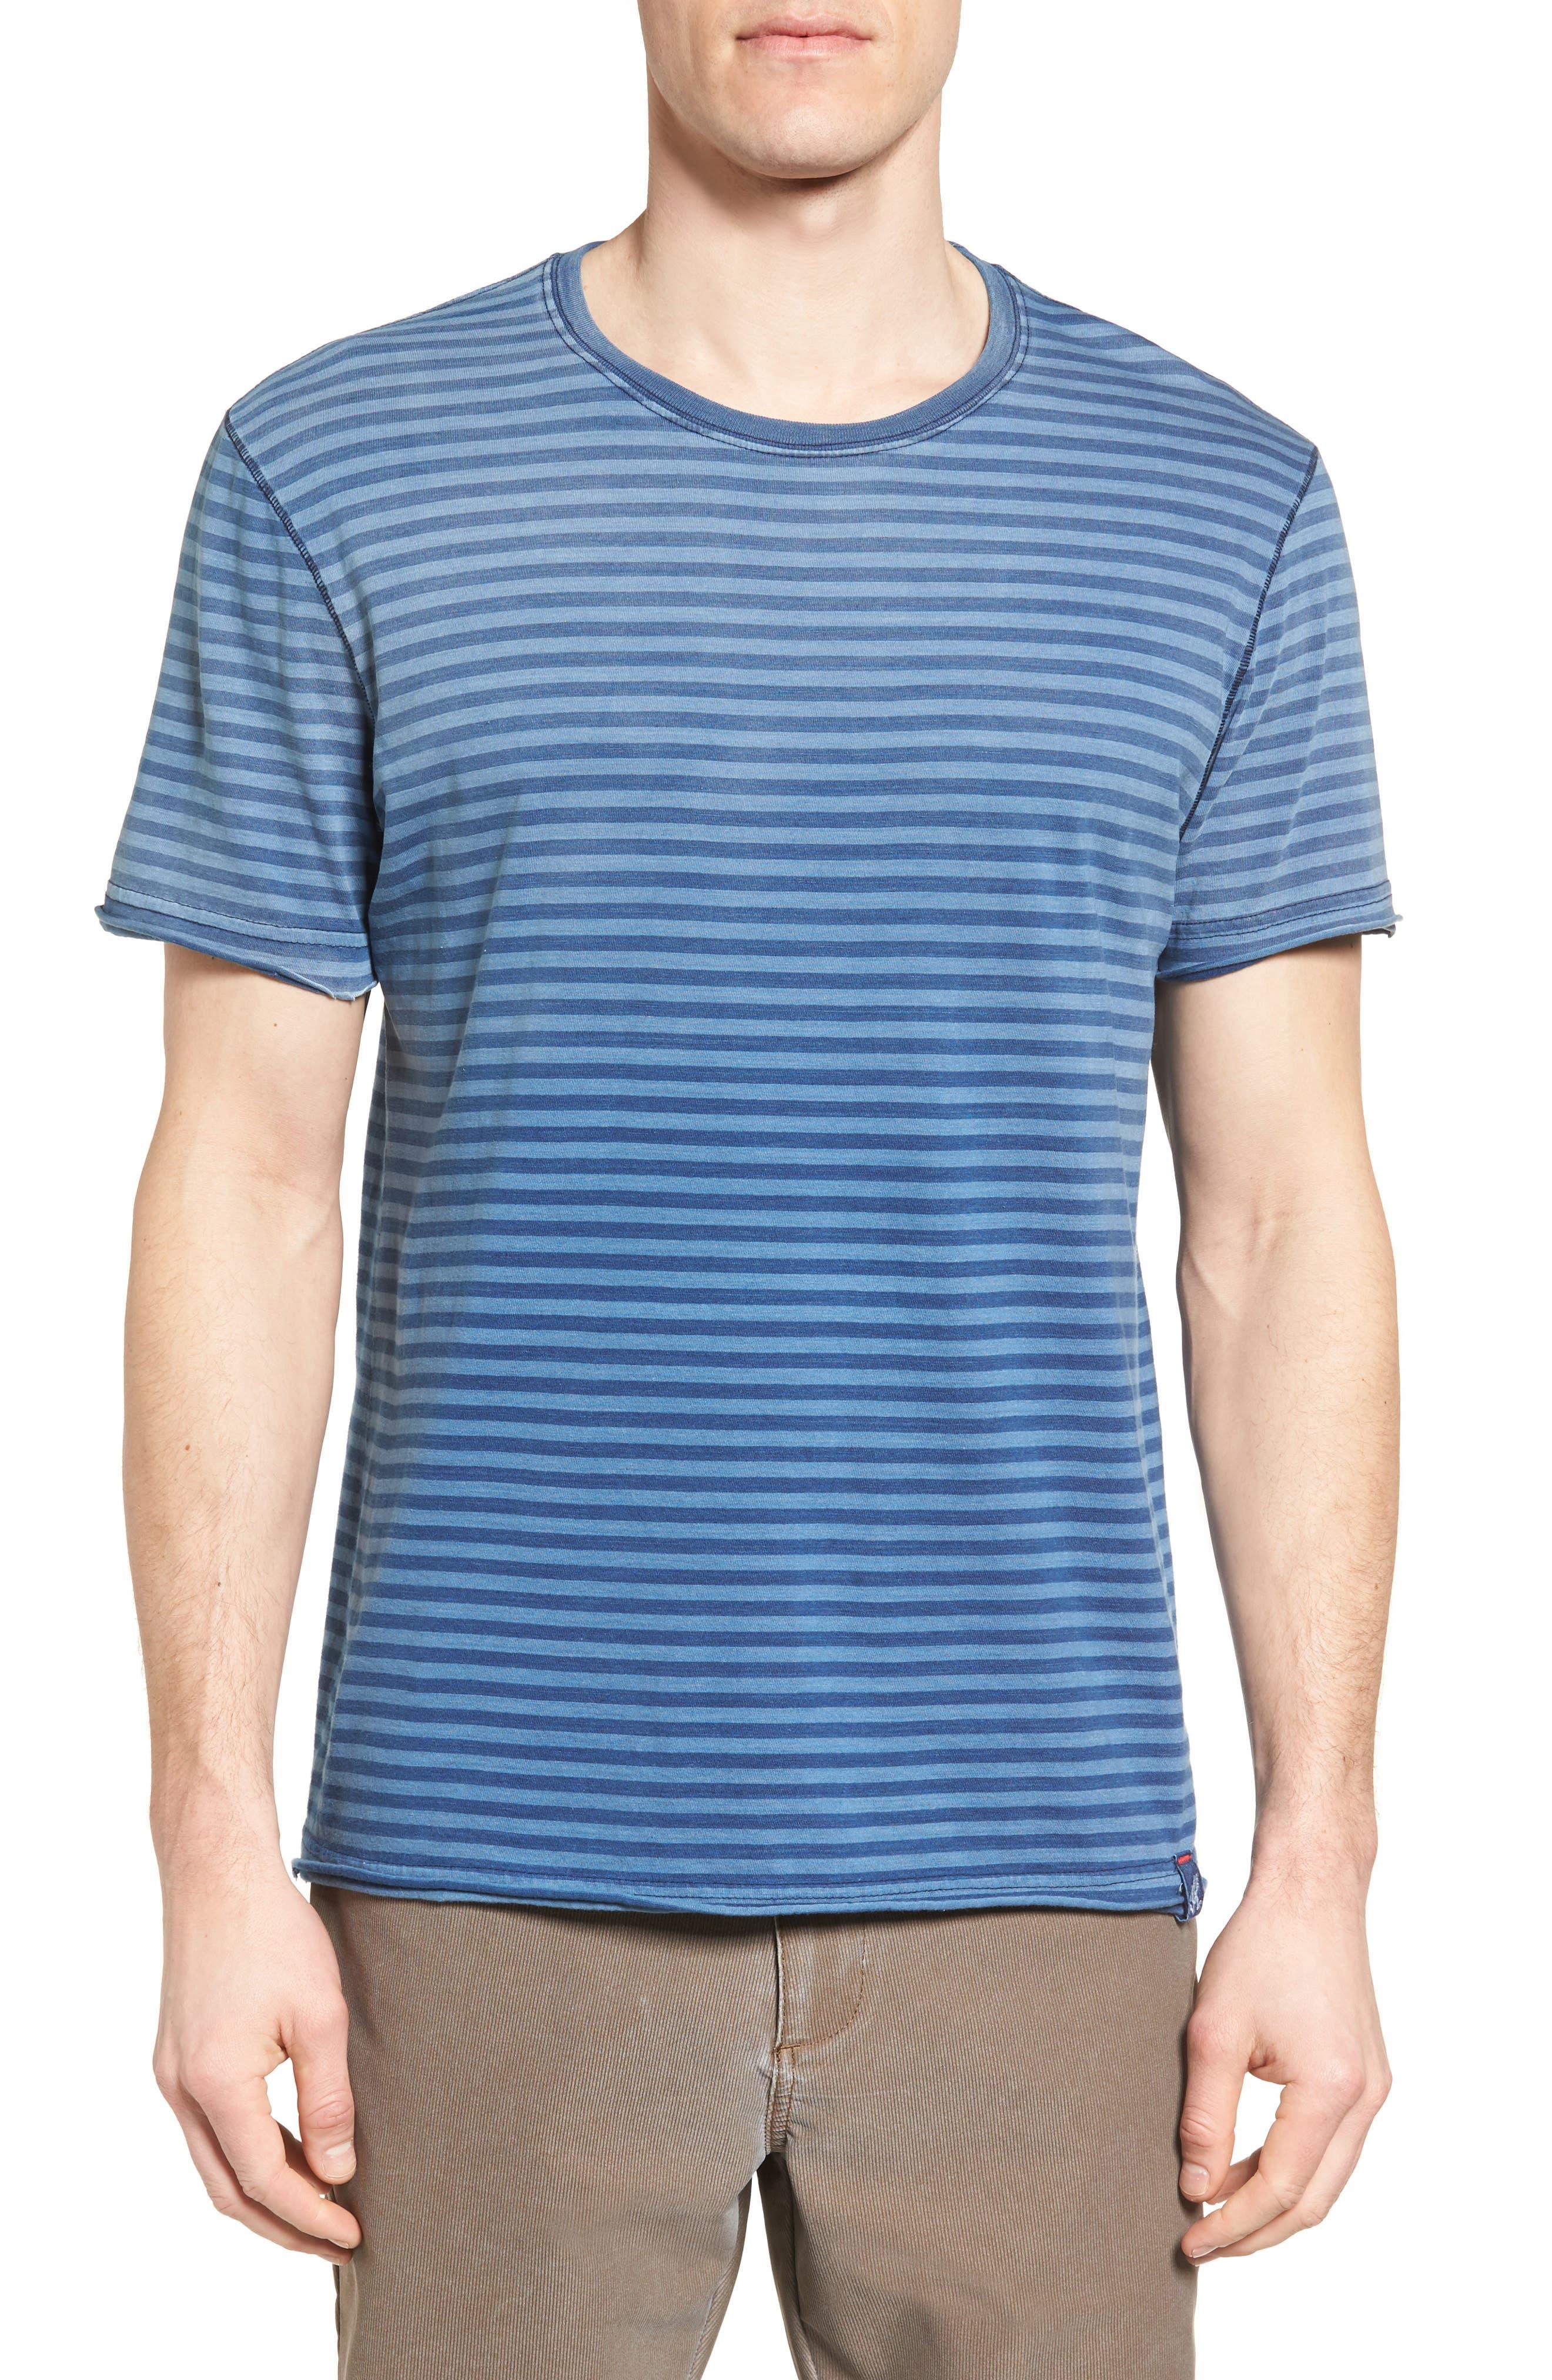 Main Image - Gramicci Take It Slow T-Shirt